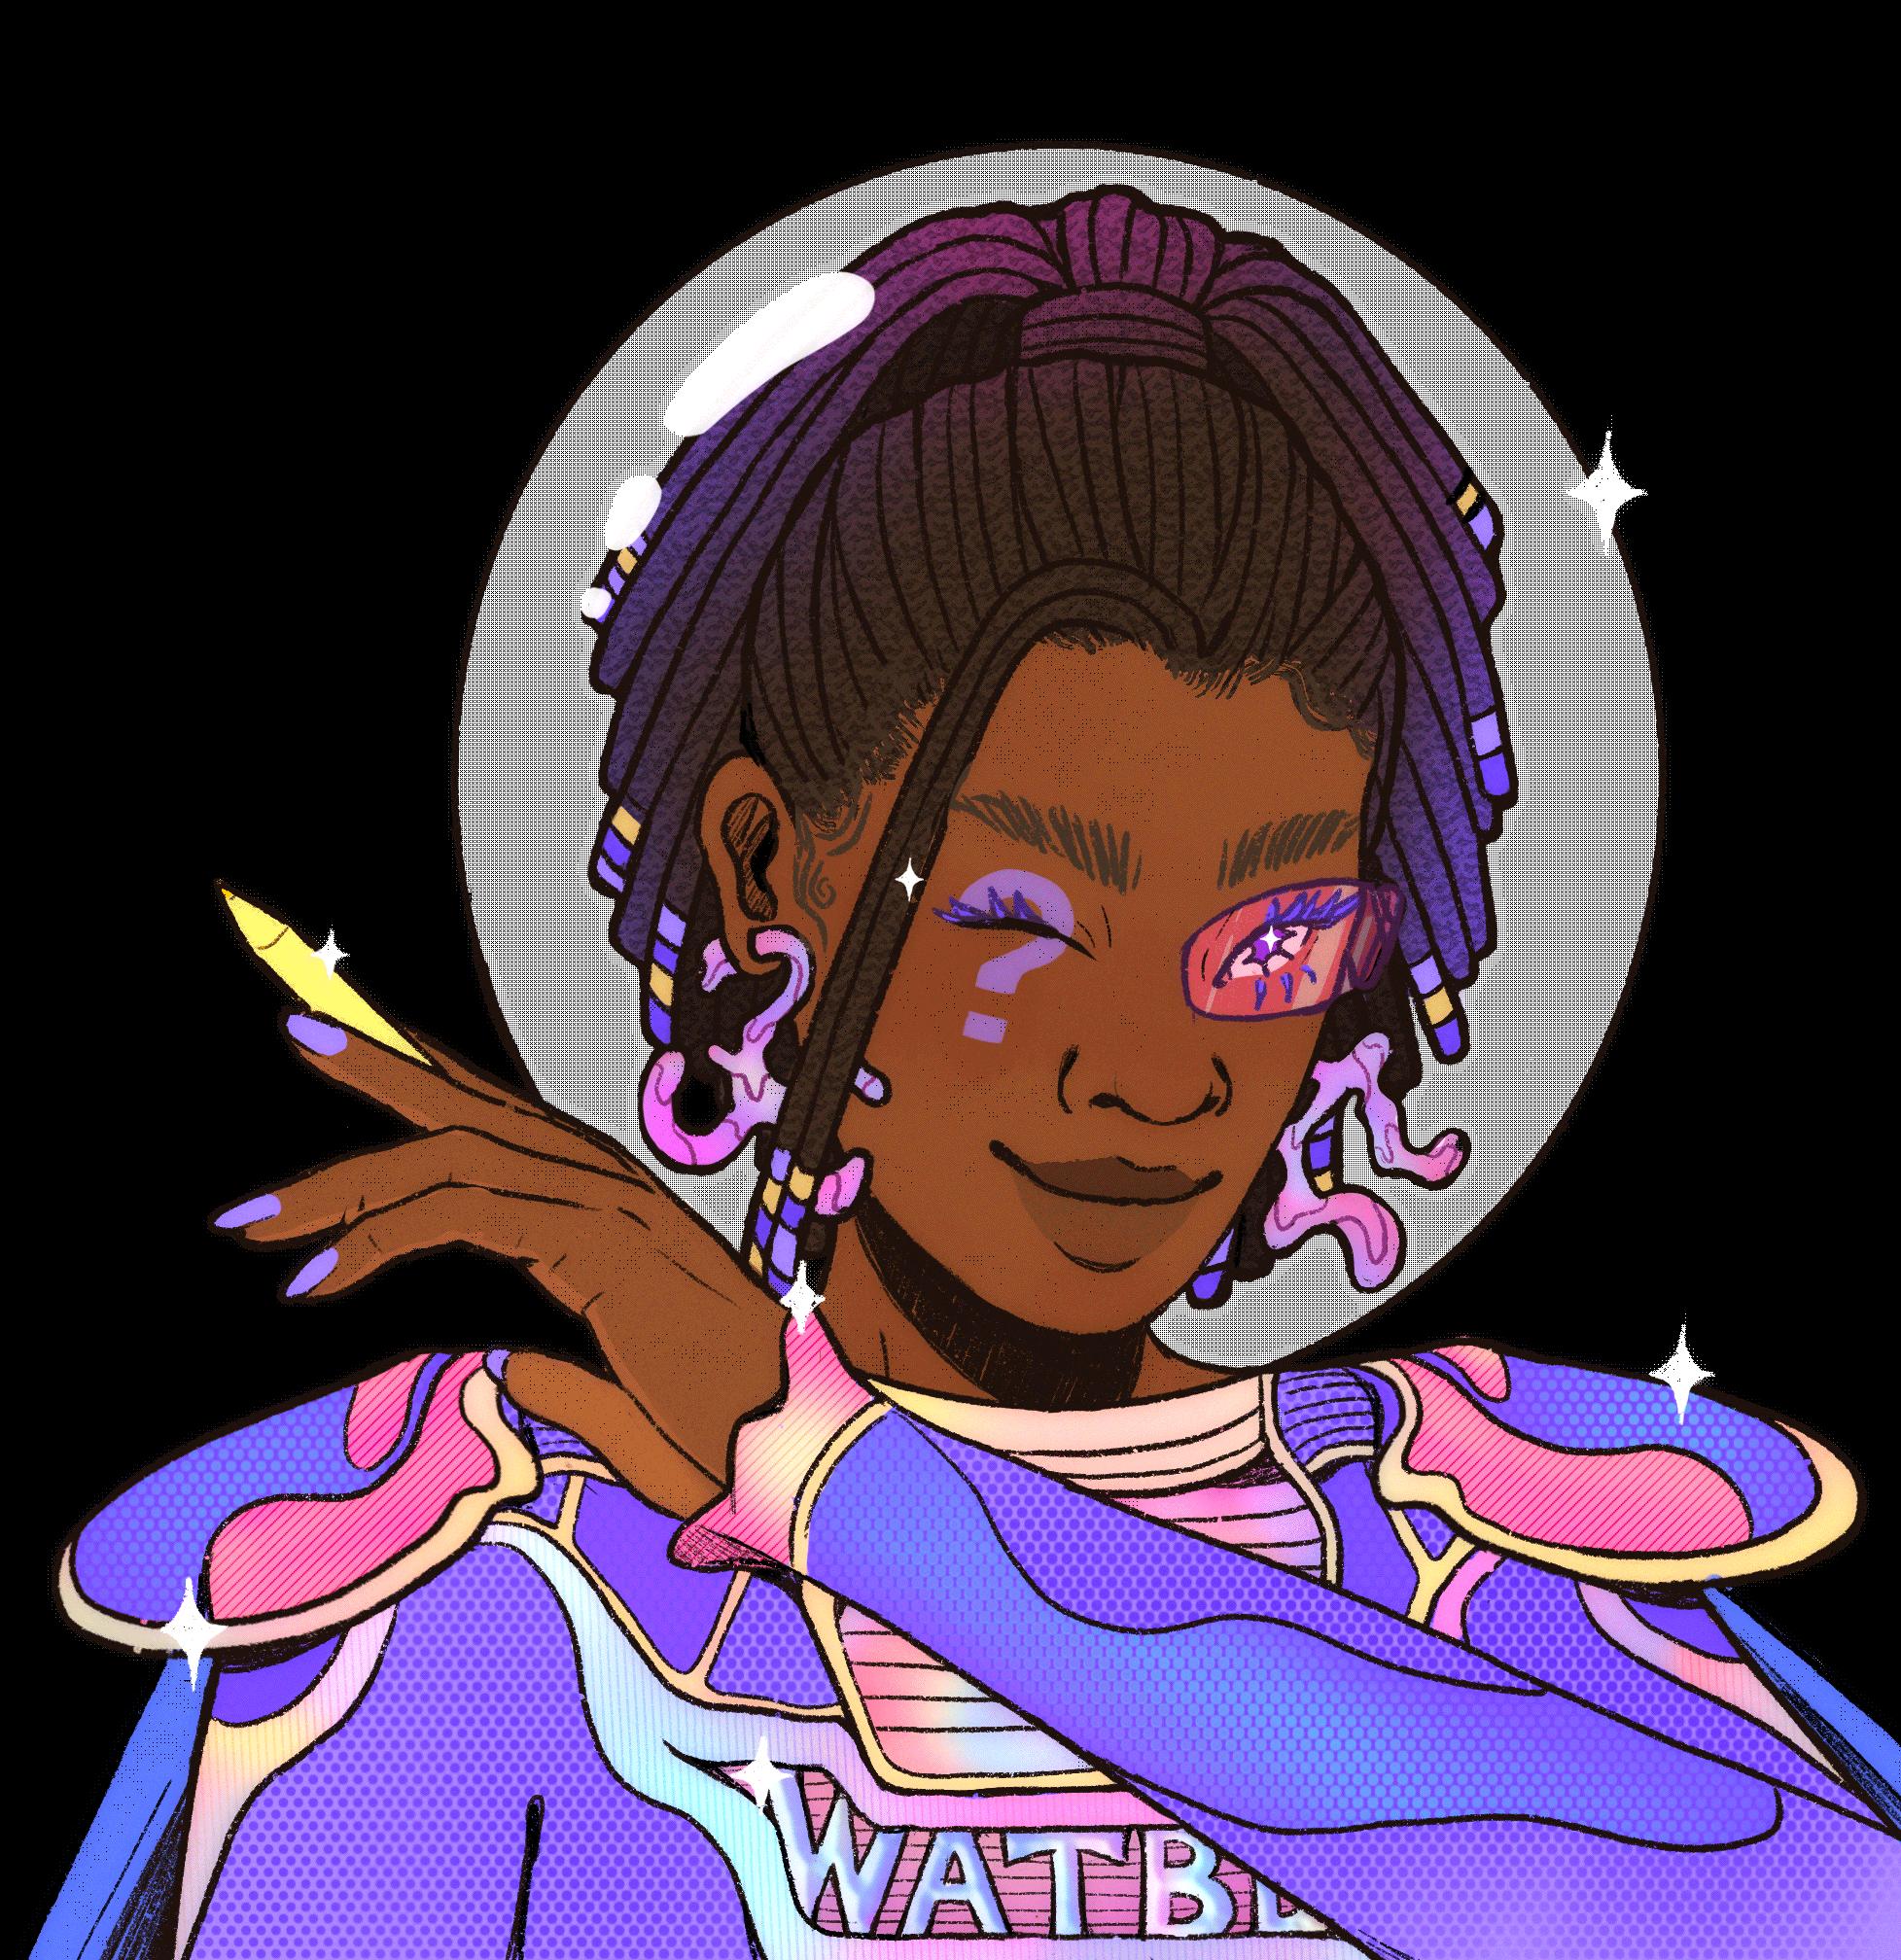 Colorful illustration of Black femme astronaut